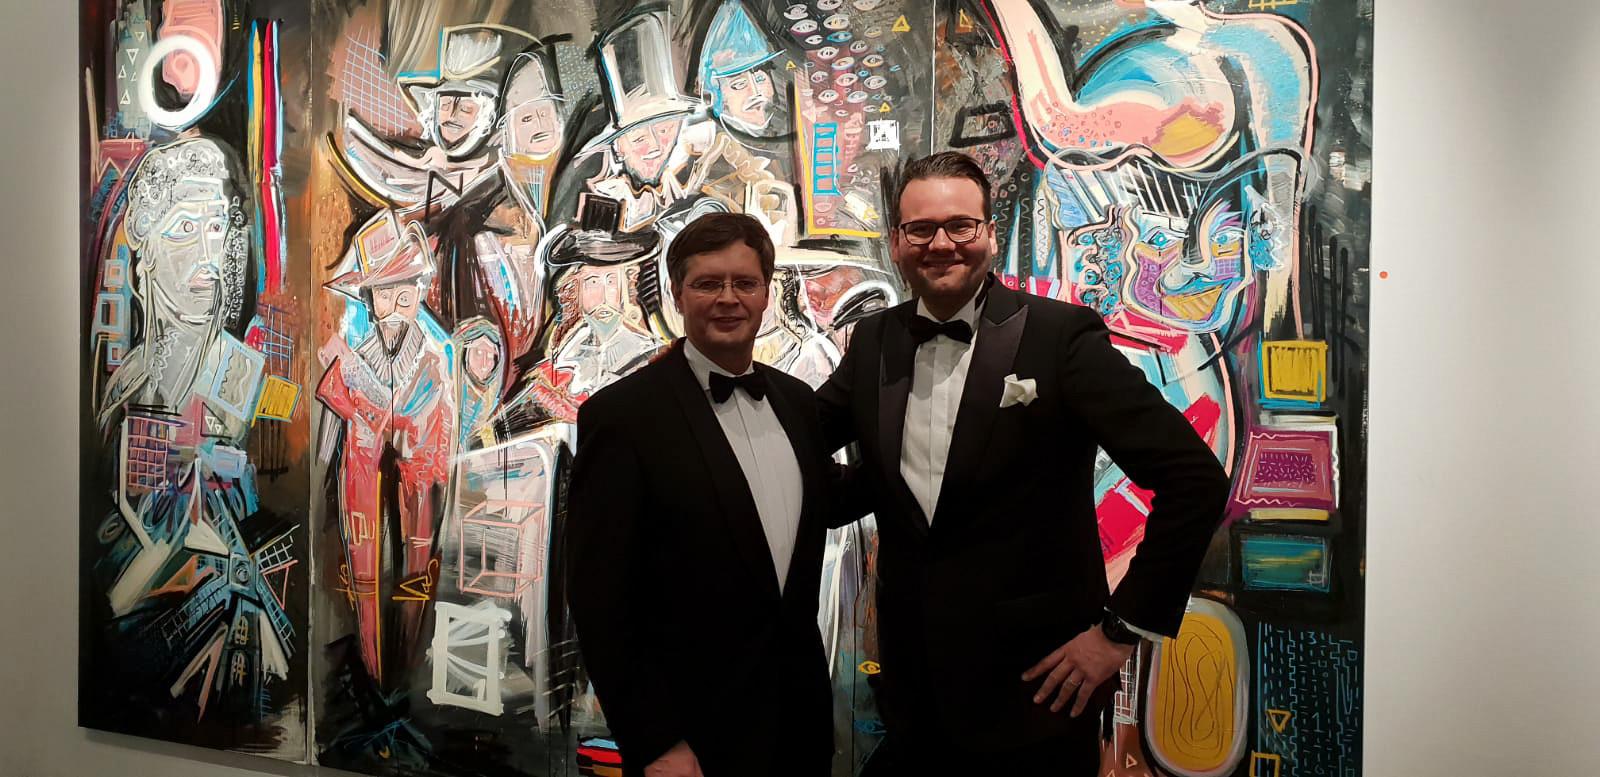 Met Jan Peter Balkenende